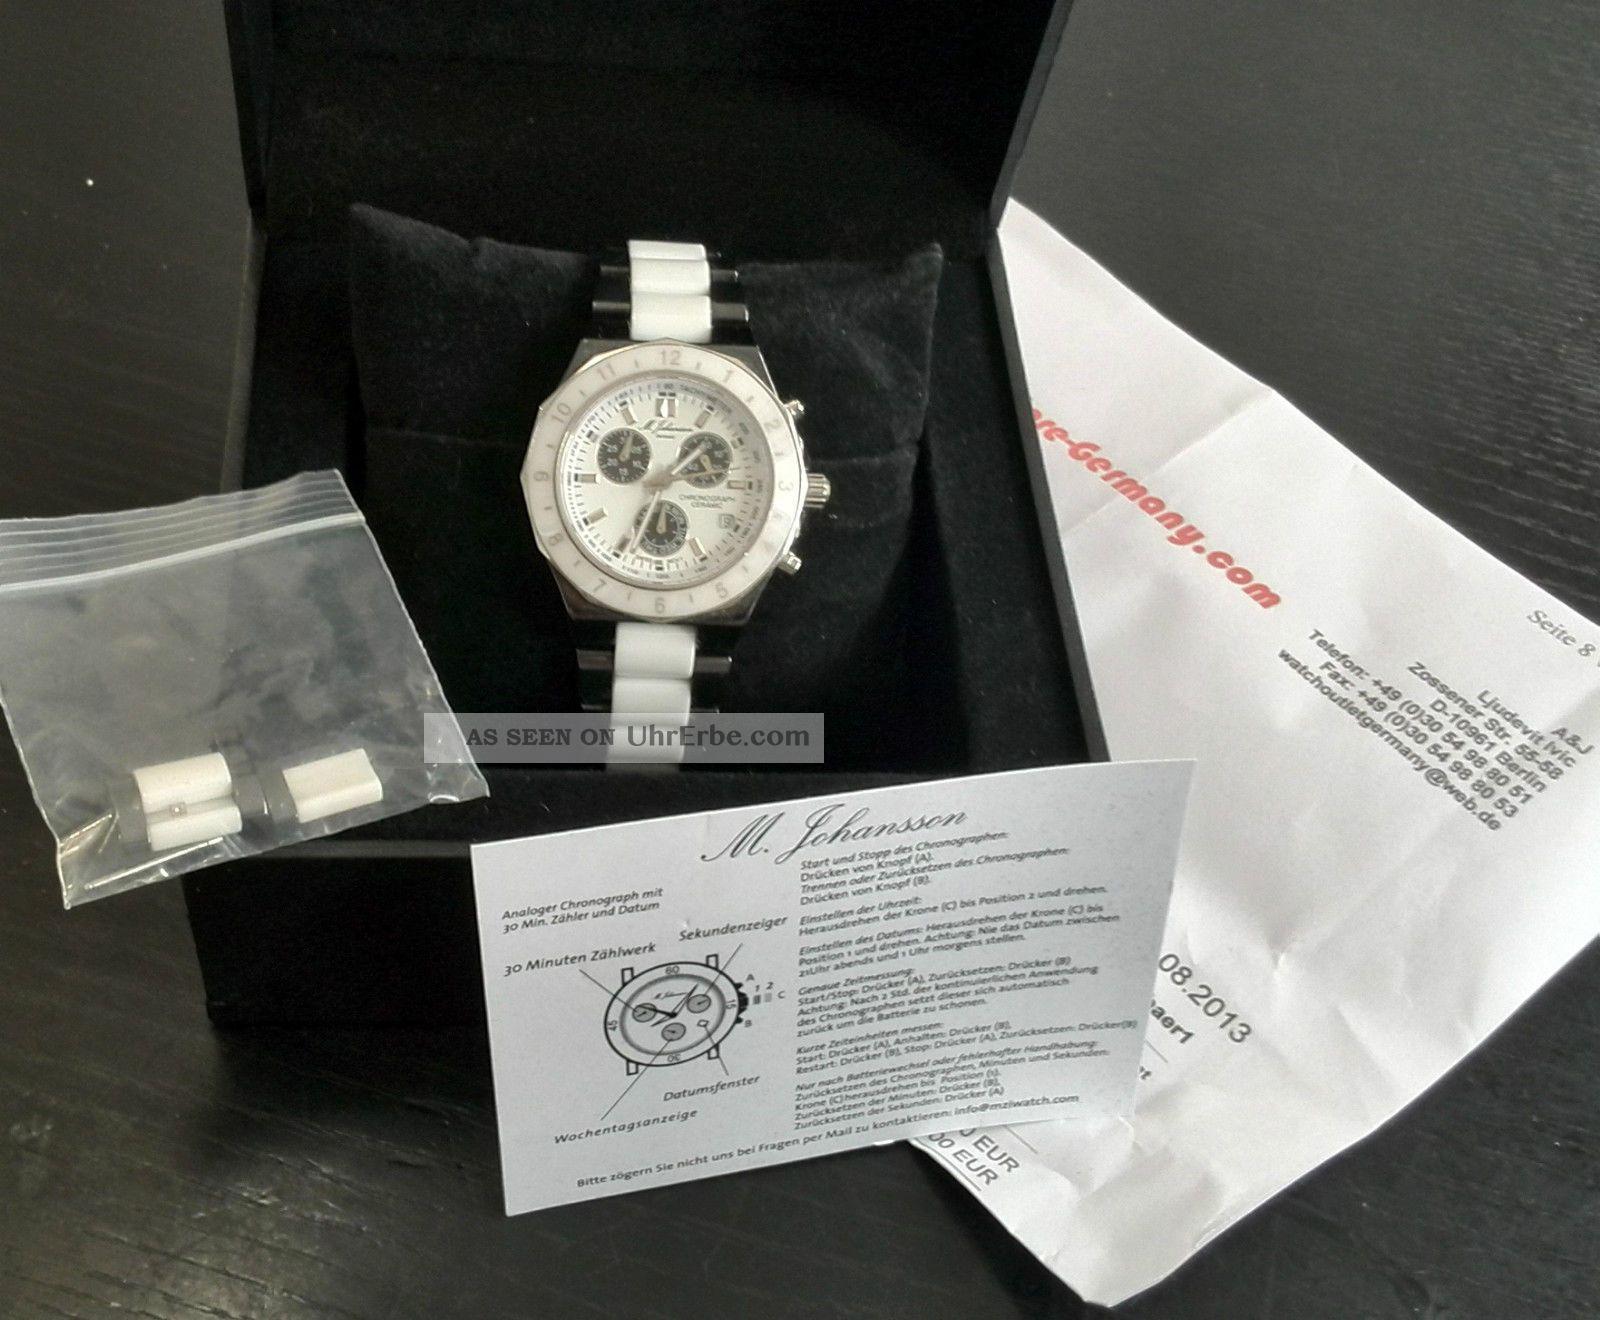 Keramik Herrenuhr Schwarz - Weiß - M.  Johansson Rechnung Armbanduhren Bild